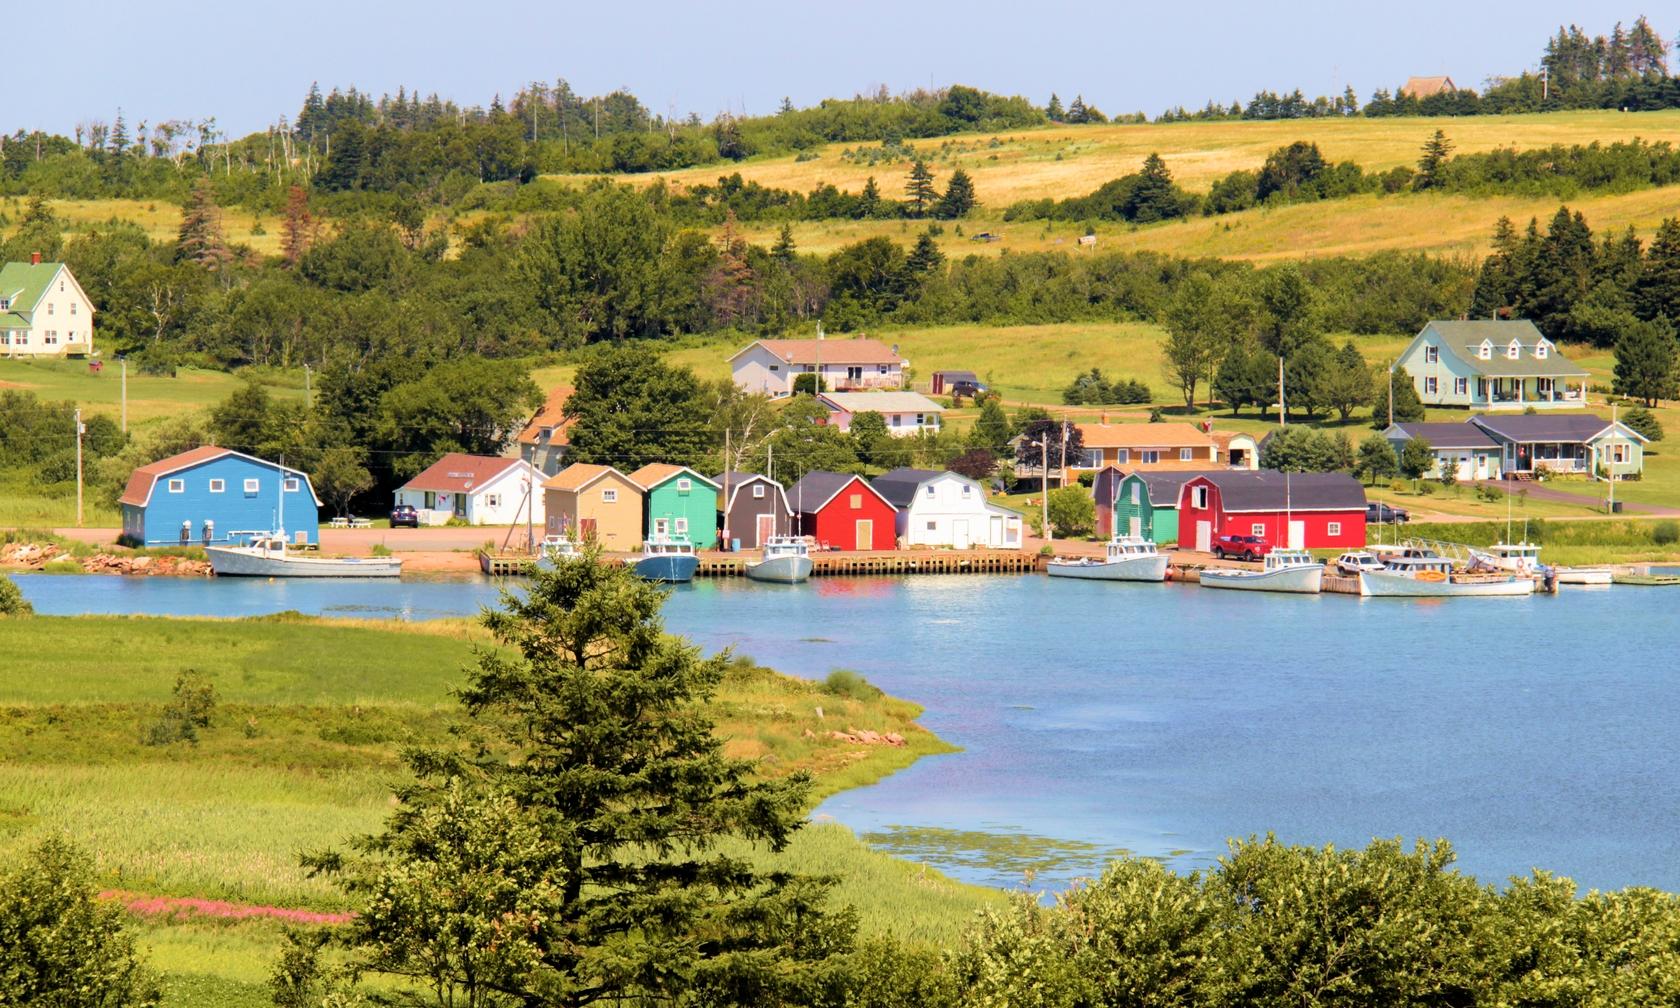 Vacation rentals in Prince Edward Island